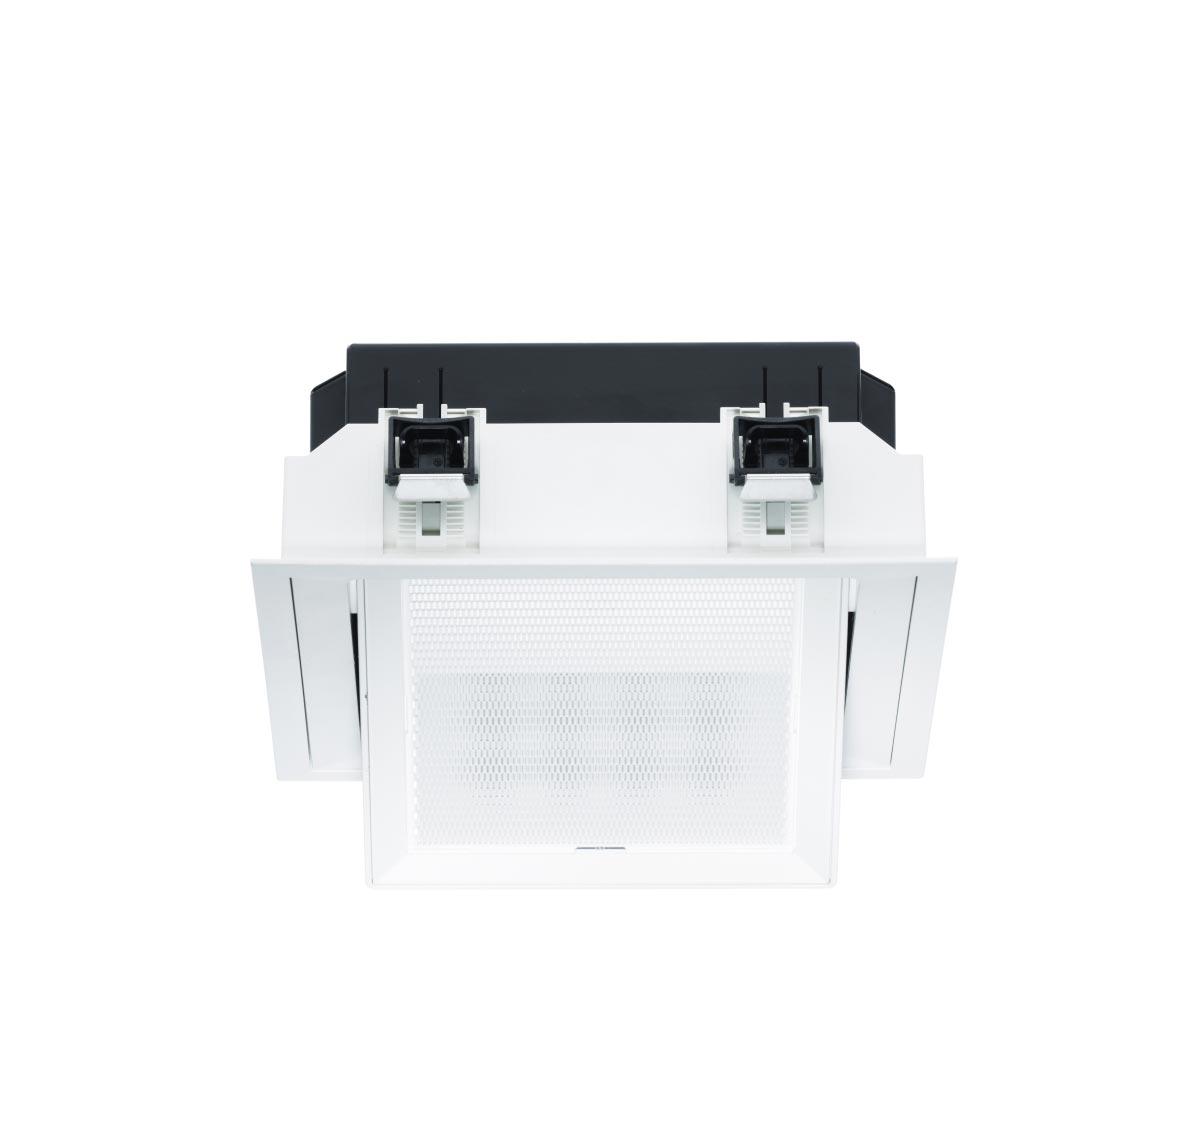 Erco light board design eur 02 01